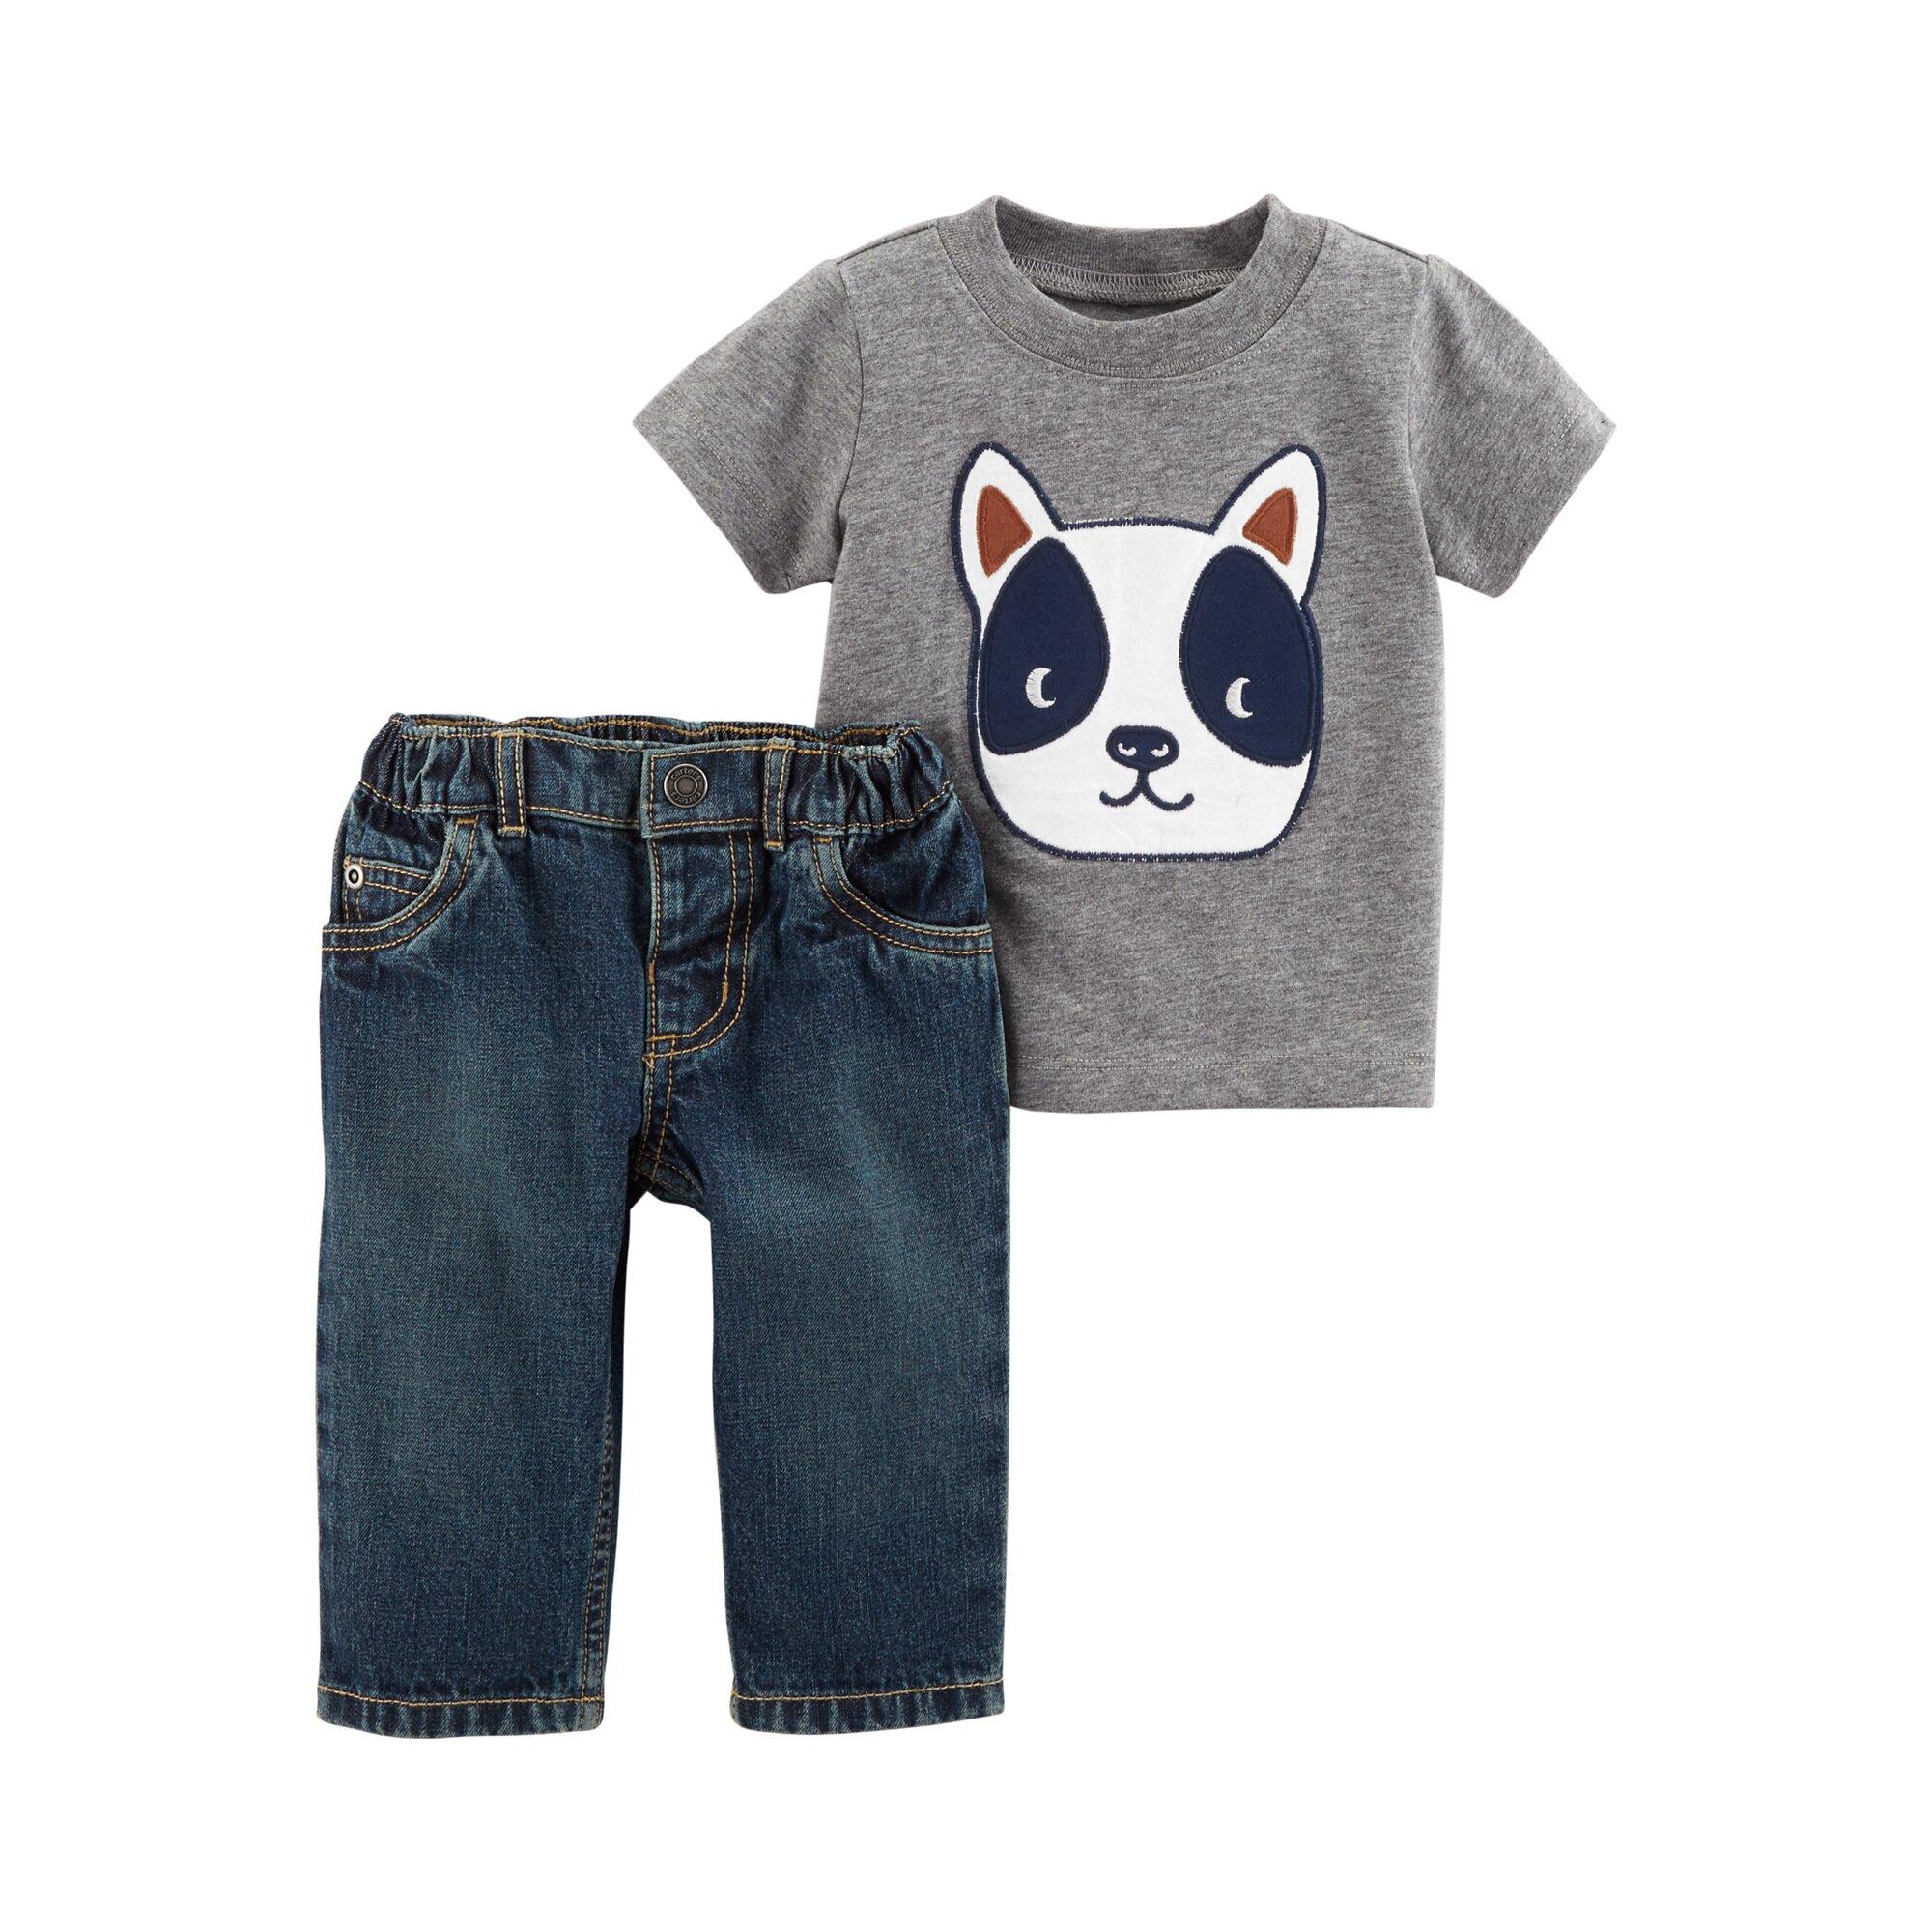 carter-s-3-tlg-set-jeans-t-shirt-und-hemd-kapuze